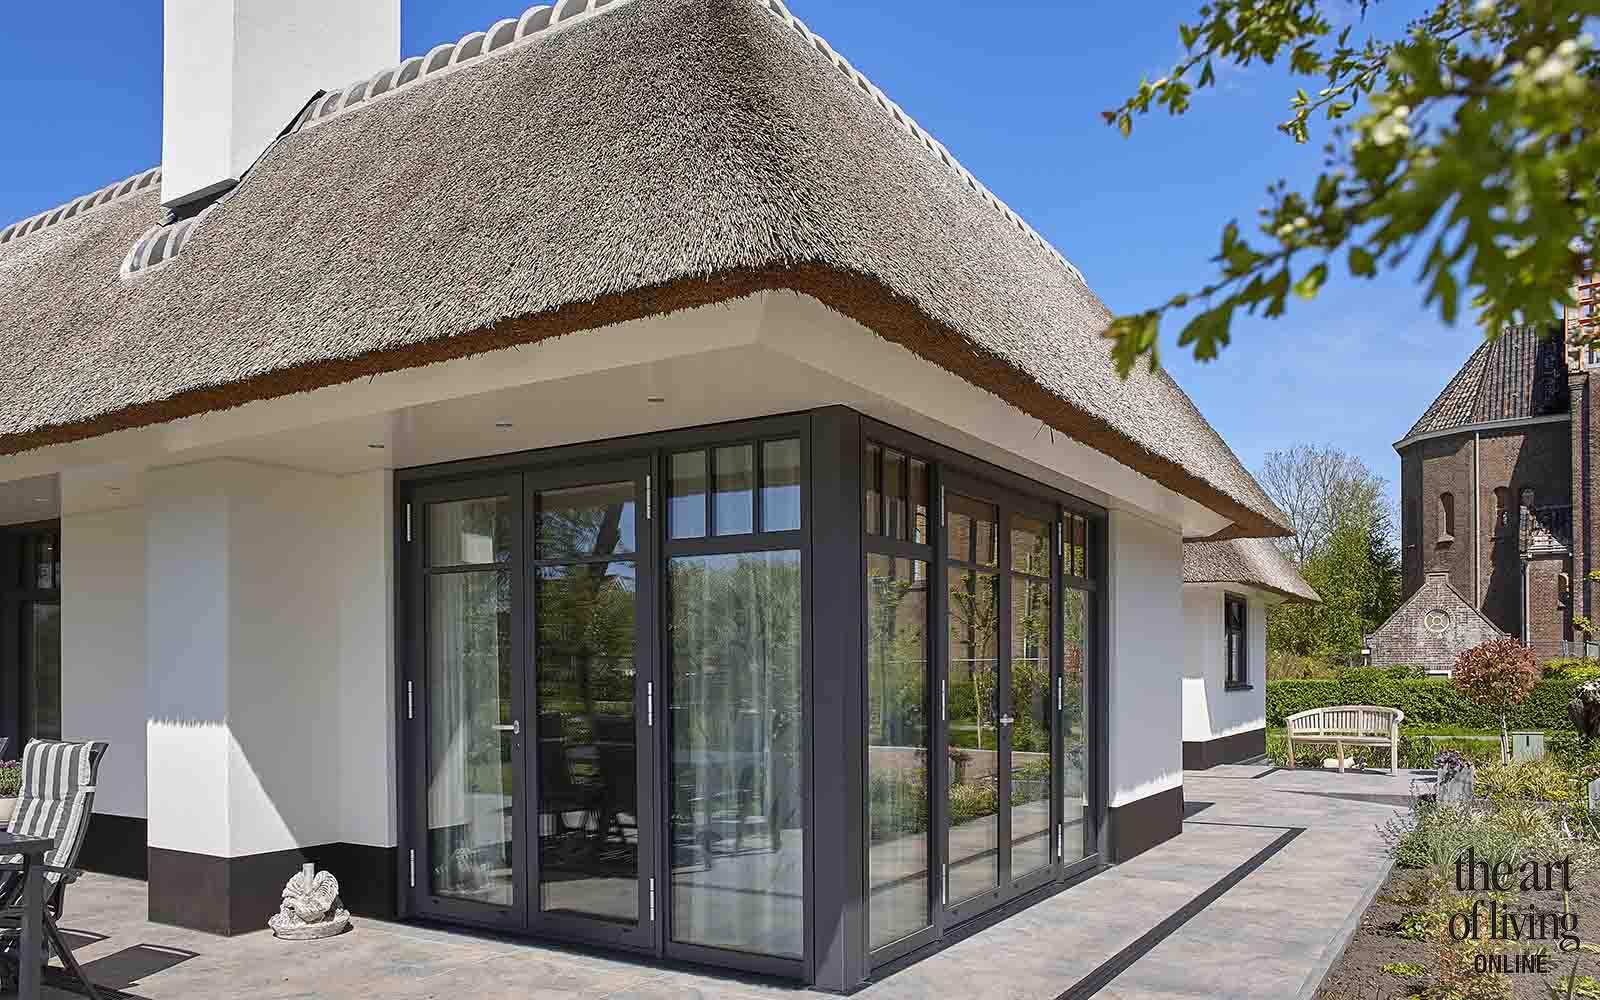 Aluminium kozijnen | Schuco, the art of living